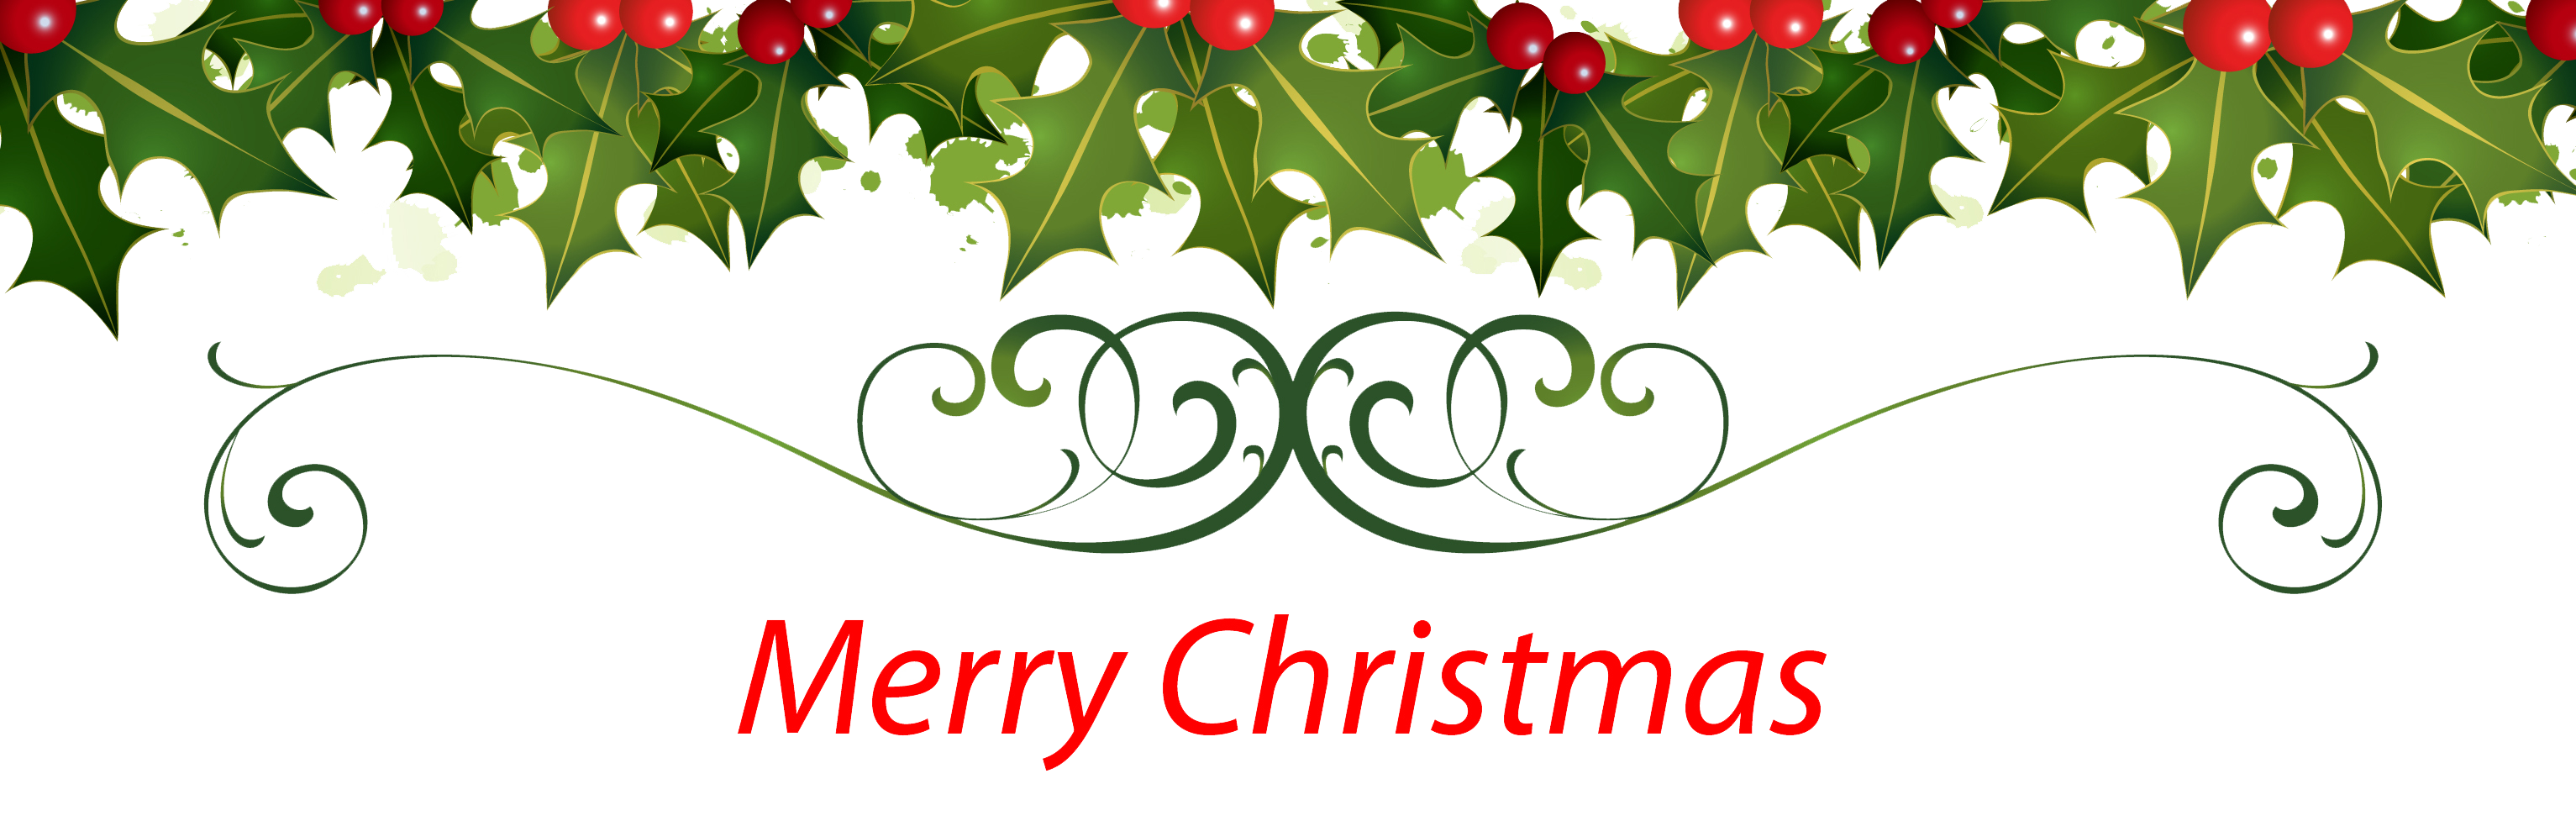 Download Christmas Free PNG Image.